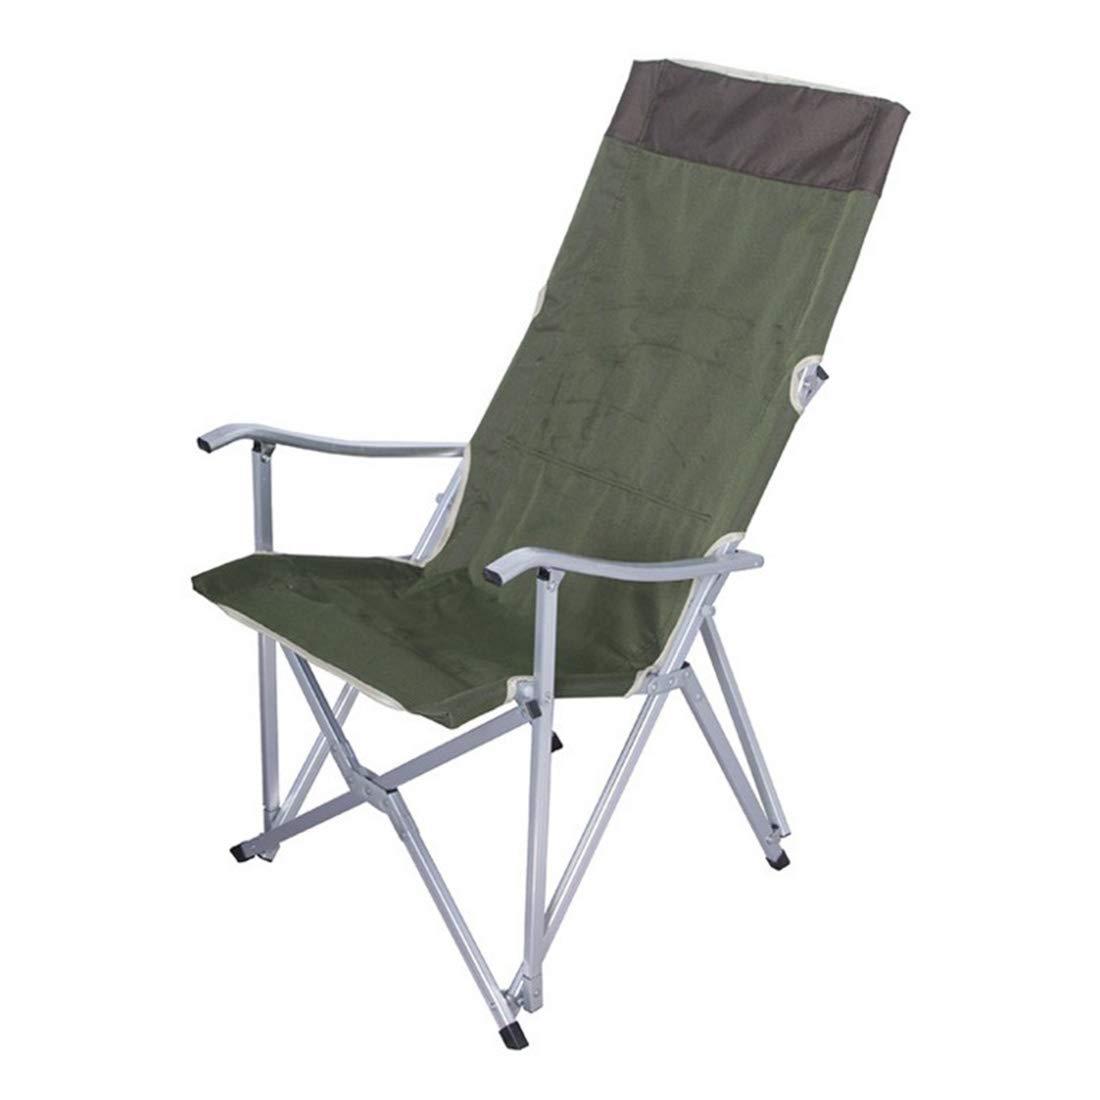 FUBULECY Outdoor Camping Stuhl mit Armlehnen Größe Aluminiumlegierung tragbare Faltbare Stuhl Daecheon Stuhl